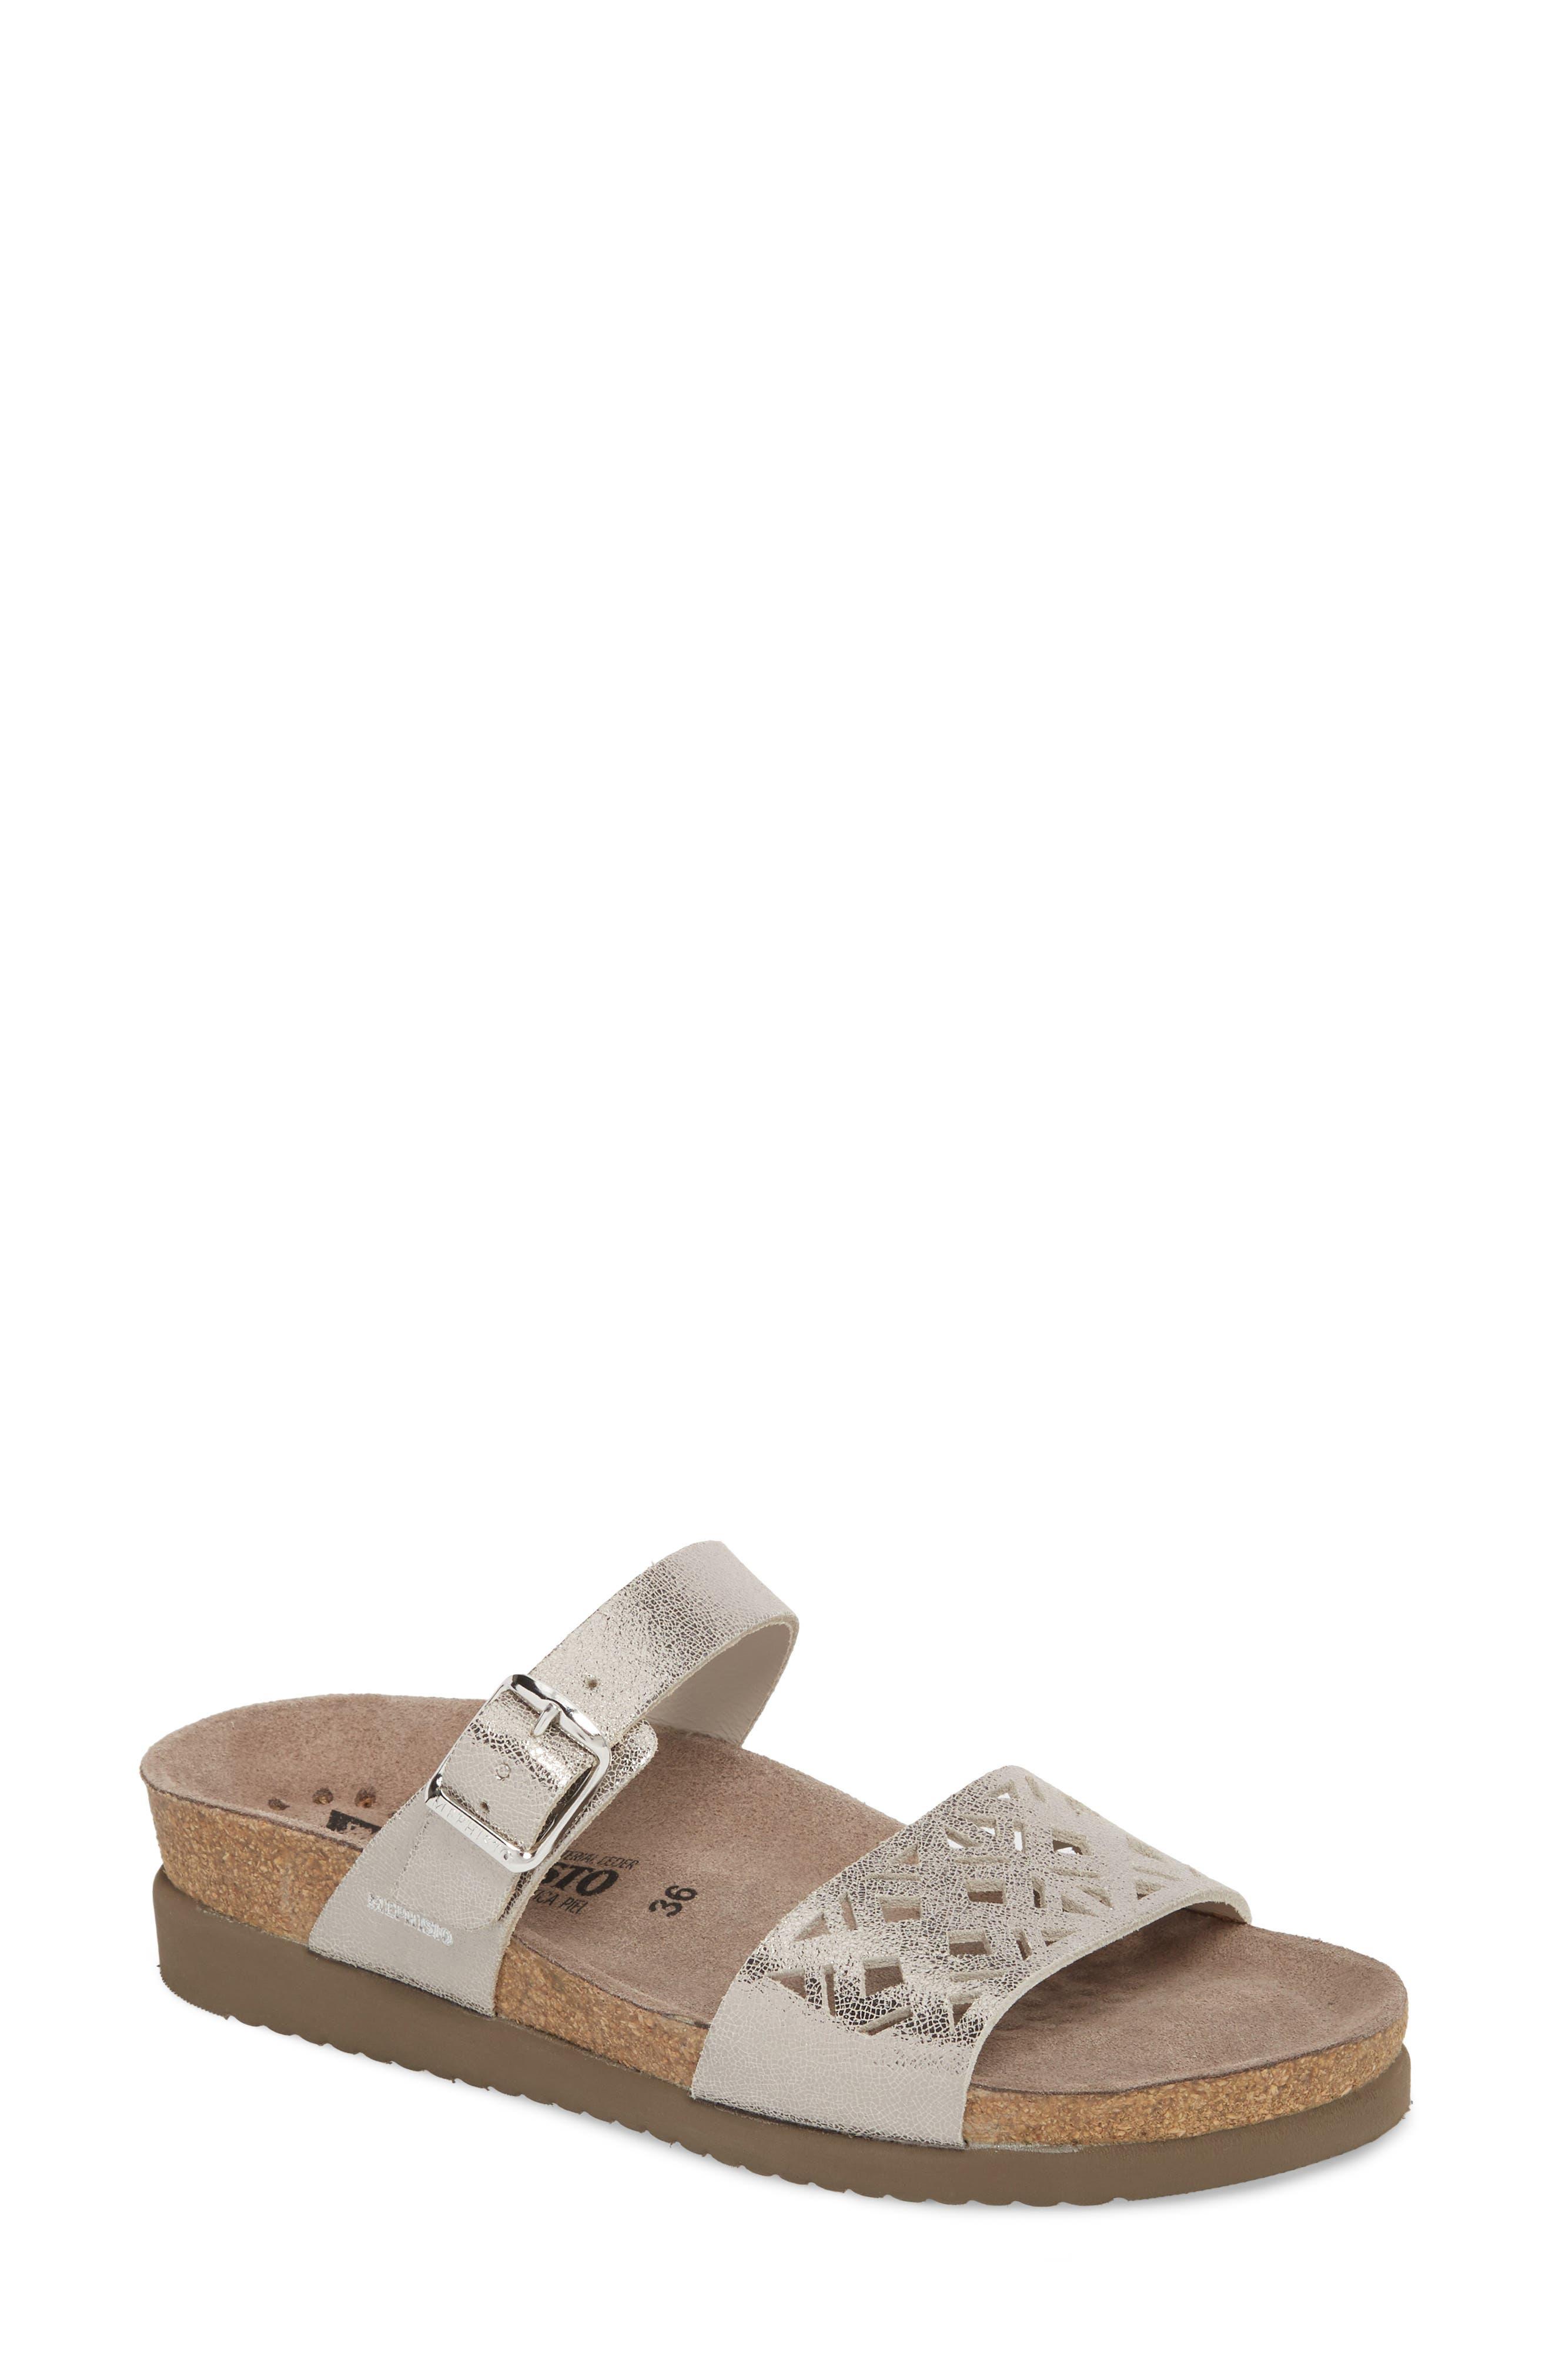 Mephisto Hirena Slide Sandal, Metallic